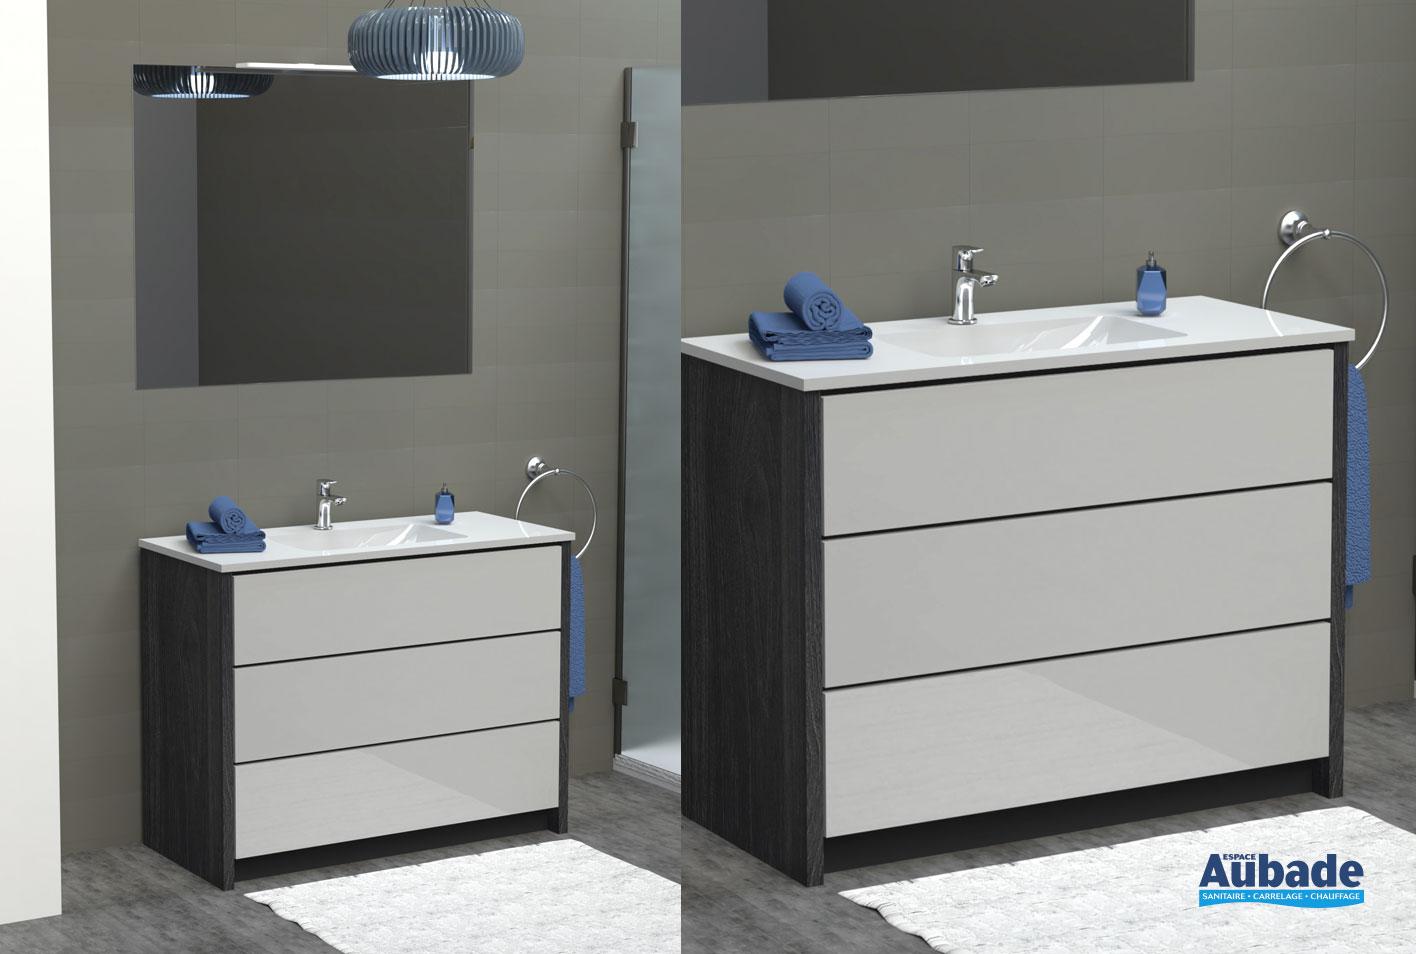 Meubles Charme Pour Plan Vasque De Lido Espace Aubade